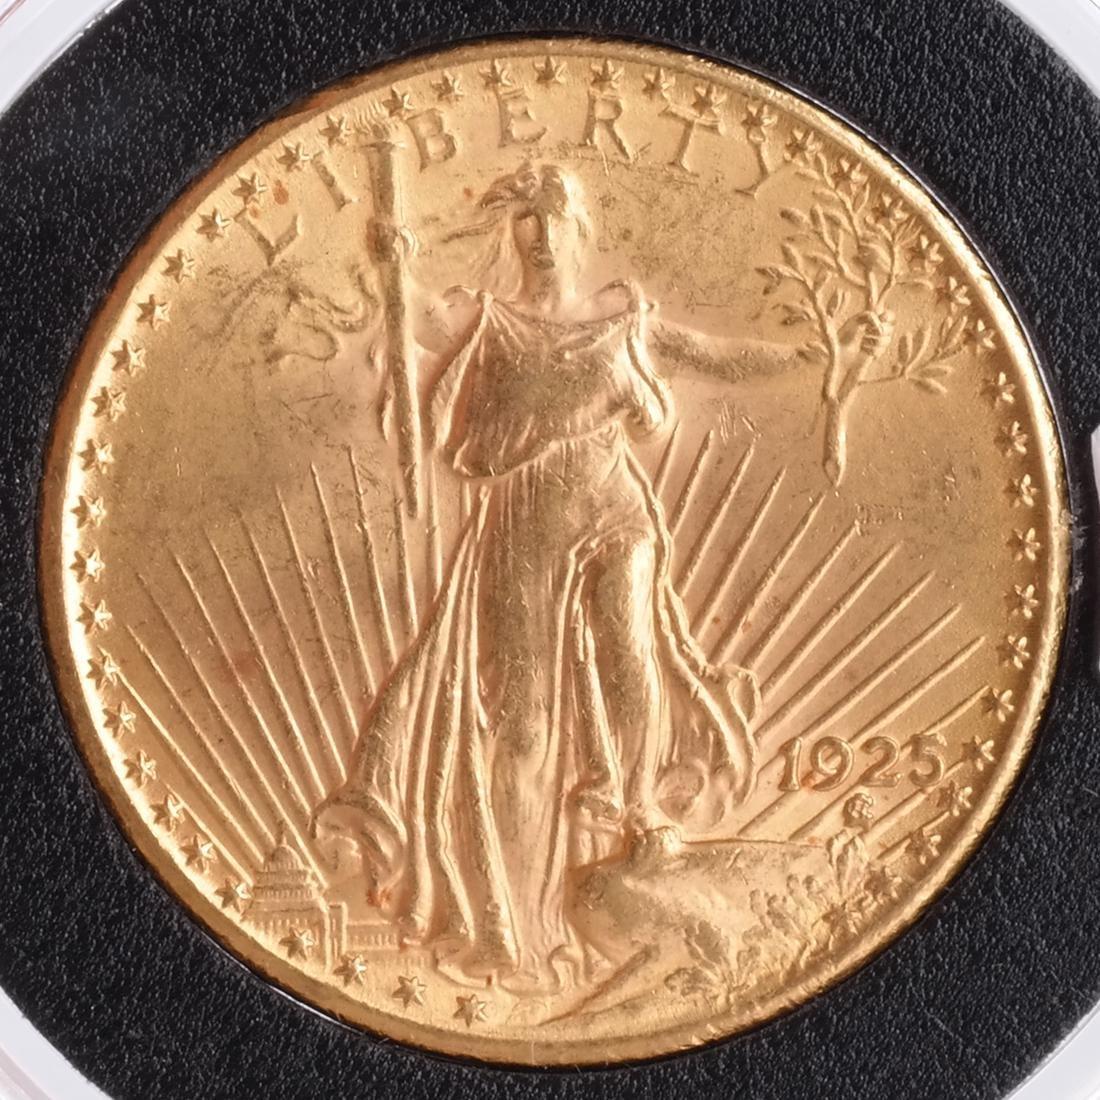 1925 $20 Gold Saint Gaudens, MS 64